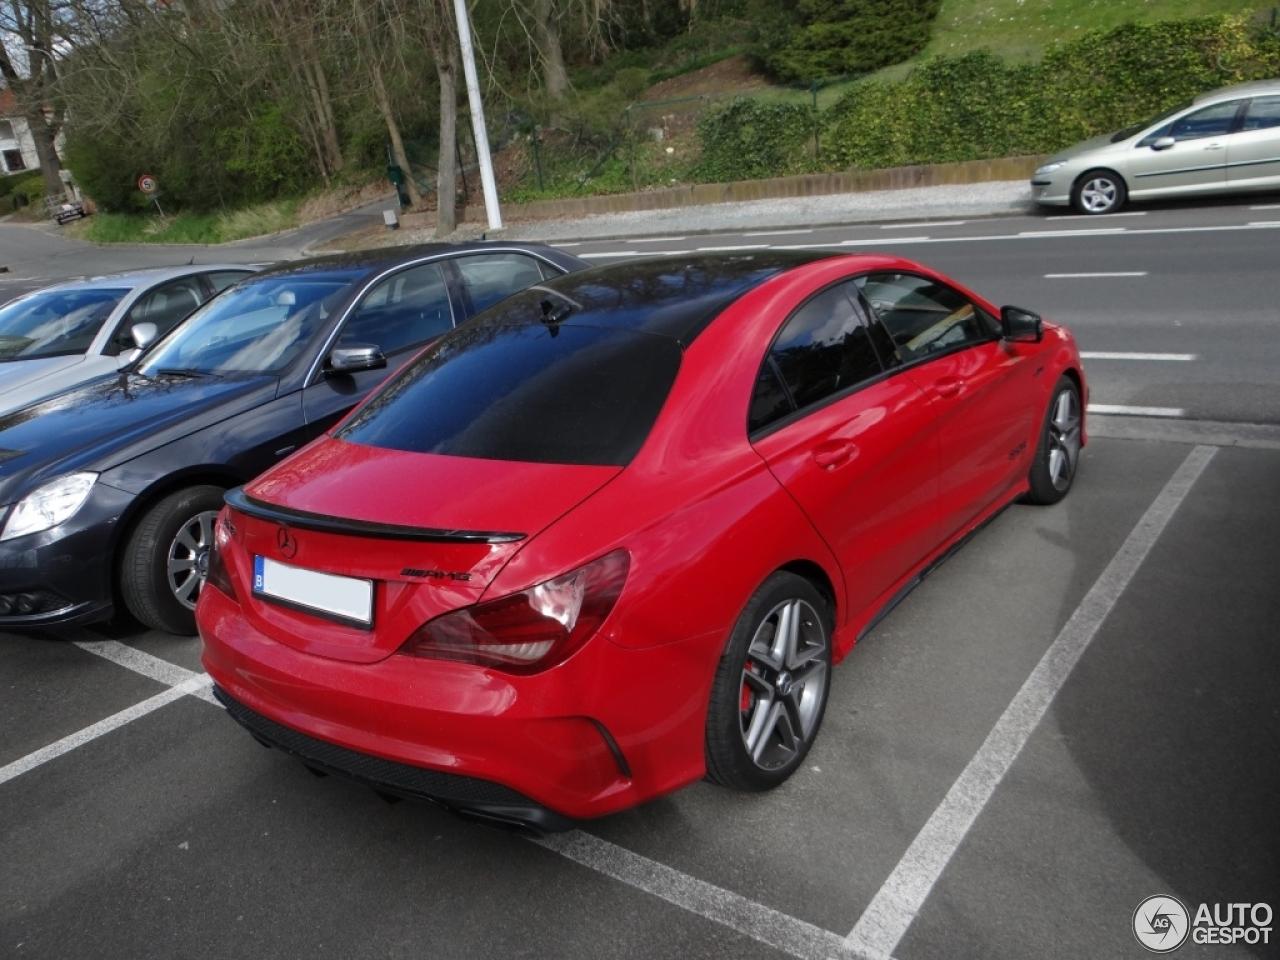 Mercedes benz cla 45 amg c117 24 march 2014 autogespot for Red mercedes benz cla